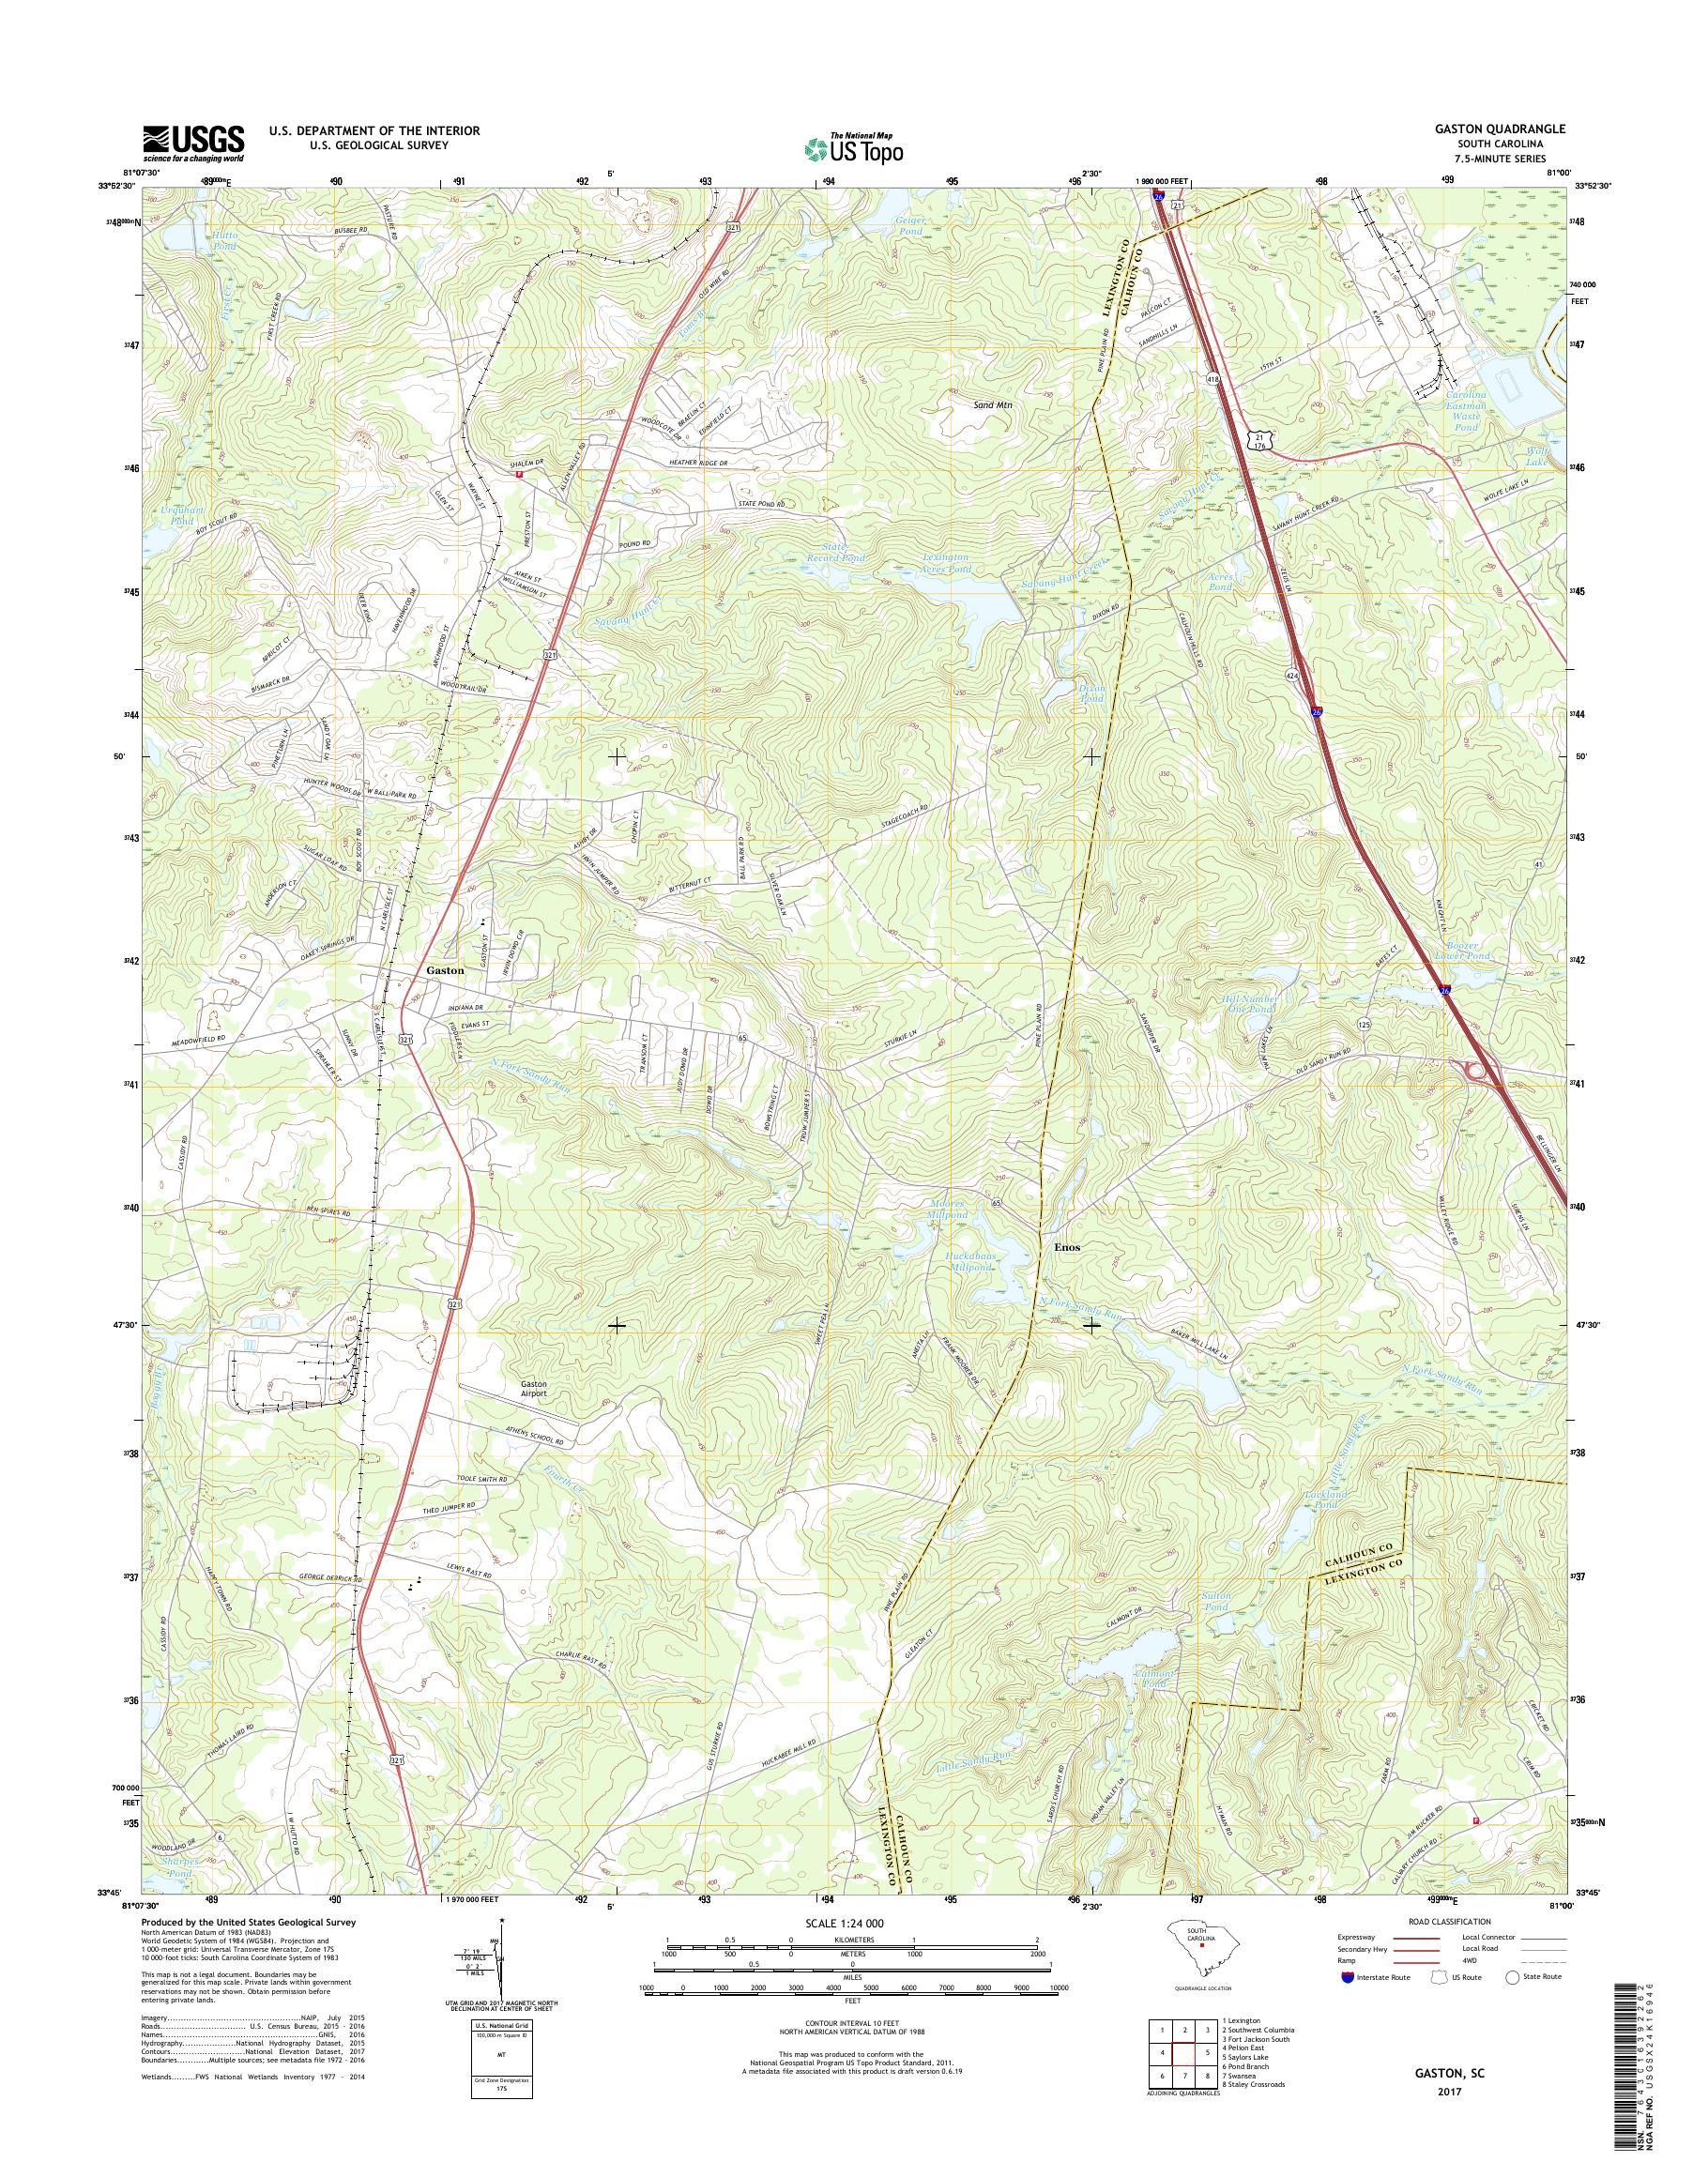 MyTopo Gaston, South Carolina USGS Quad Topo Map